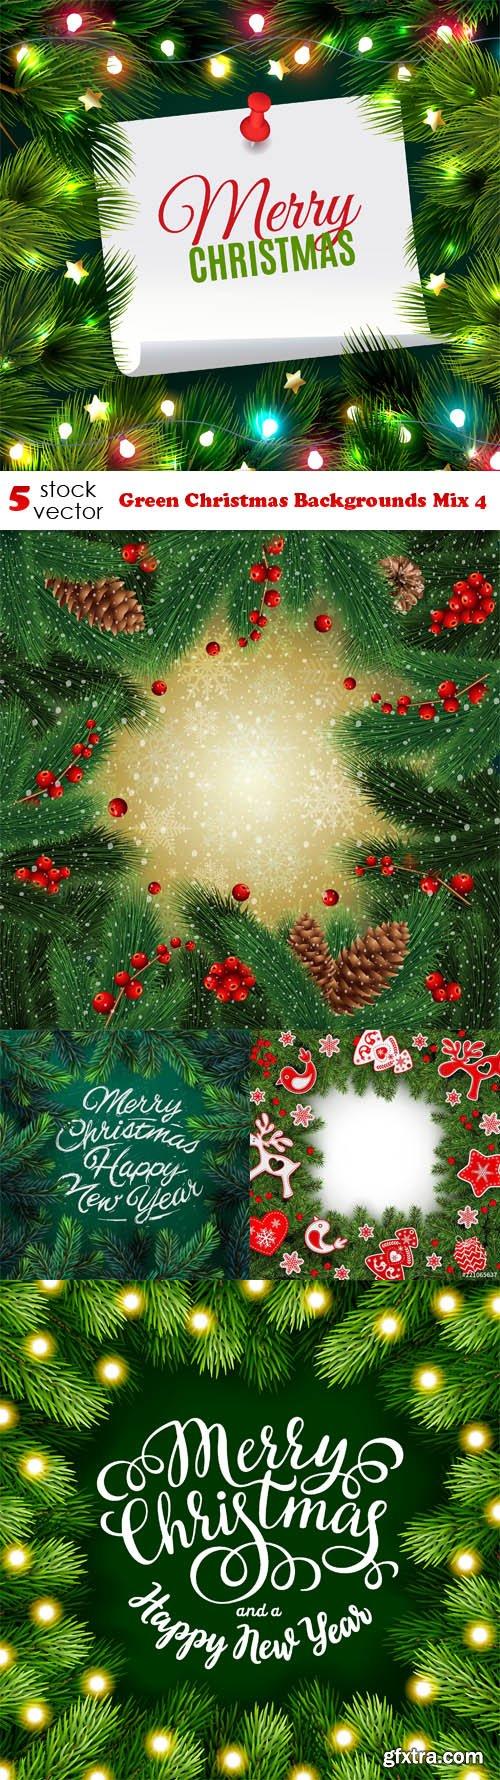 Vectors - Green Christmas Backgrounds Mix 4